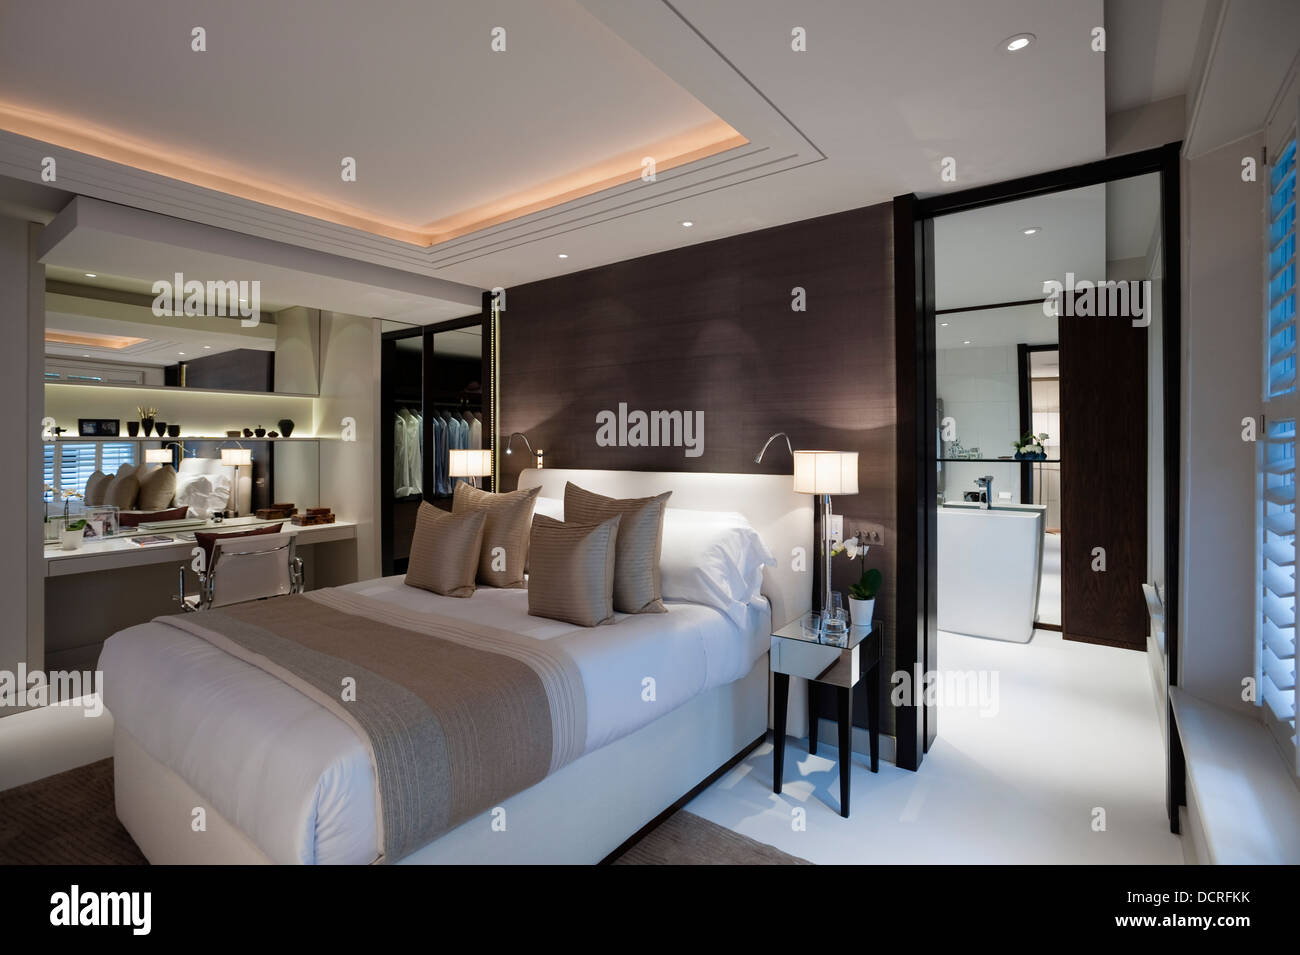 Bedroom En Suite Bathroom: Bedroom Of London City Apartment With En Suite Bathroom